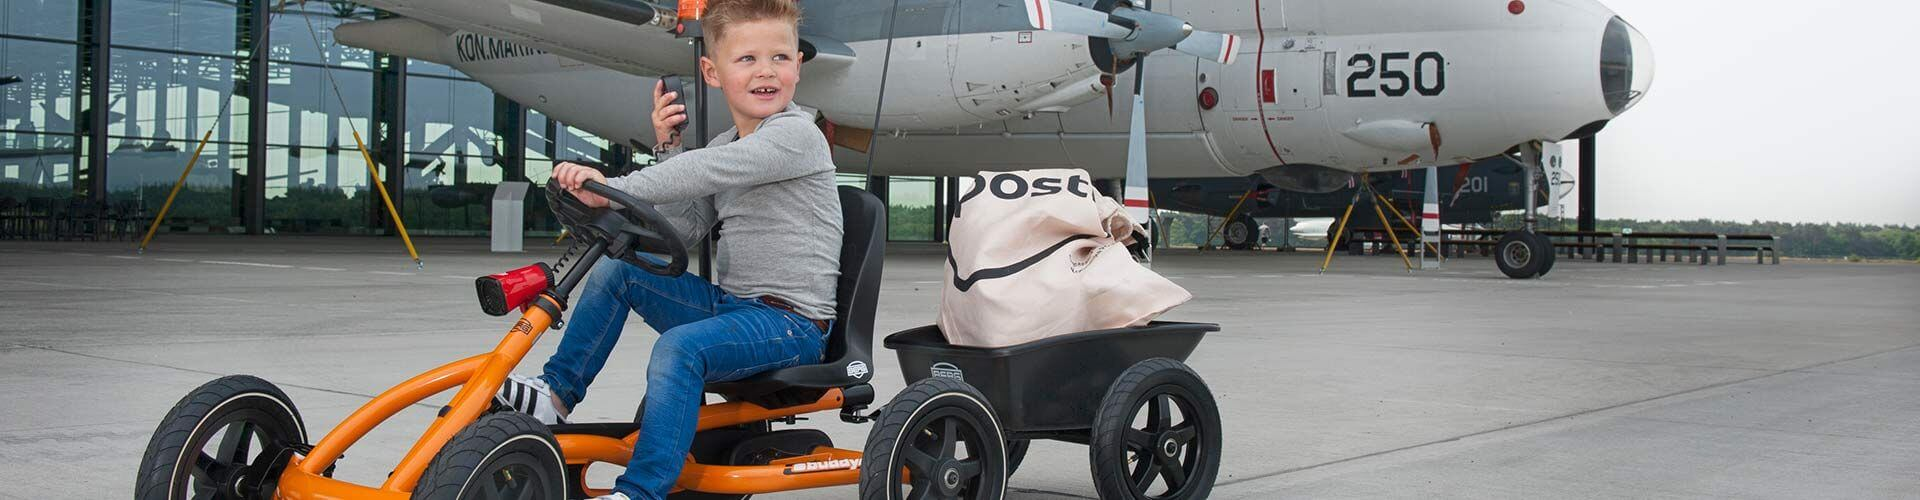 Pedal-Gokart-Zubehör zum BERG Buddy bei gokart-profi.de